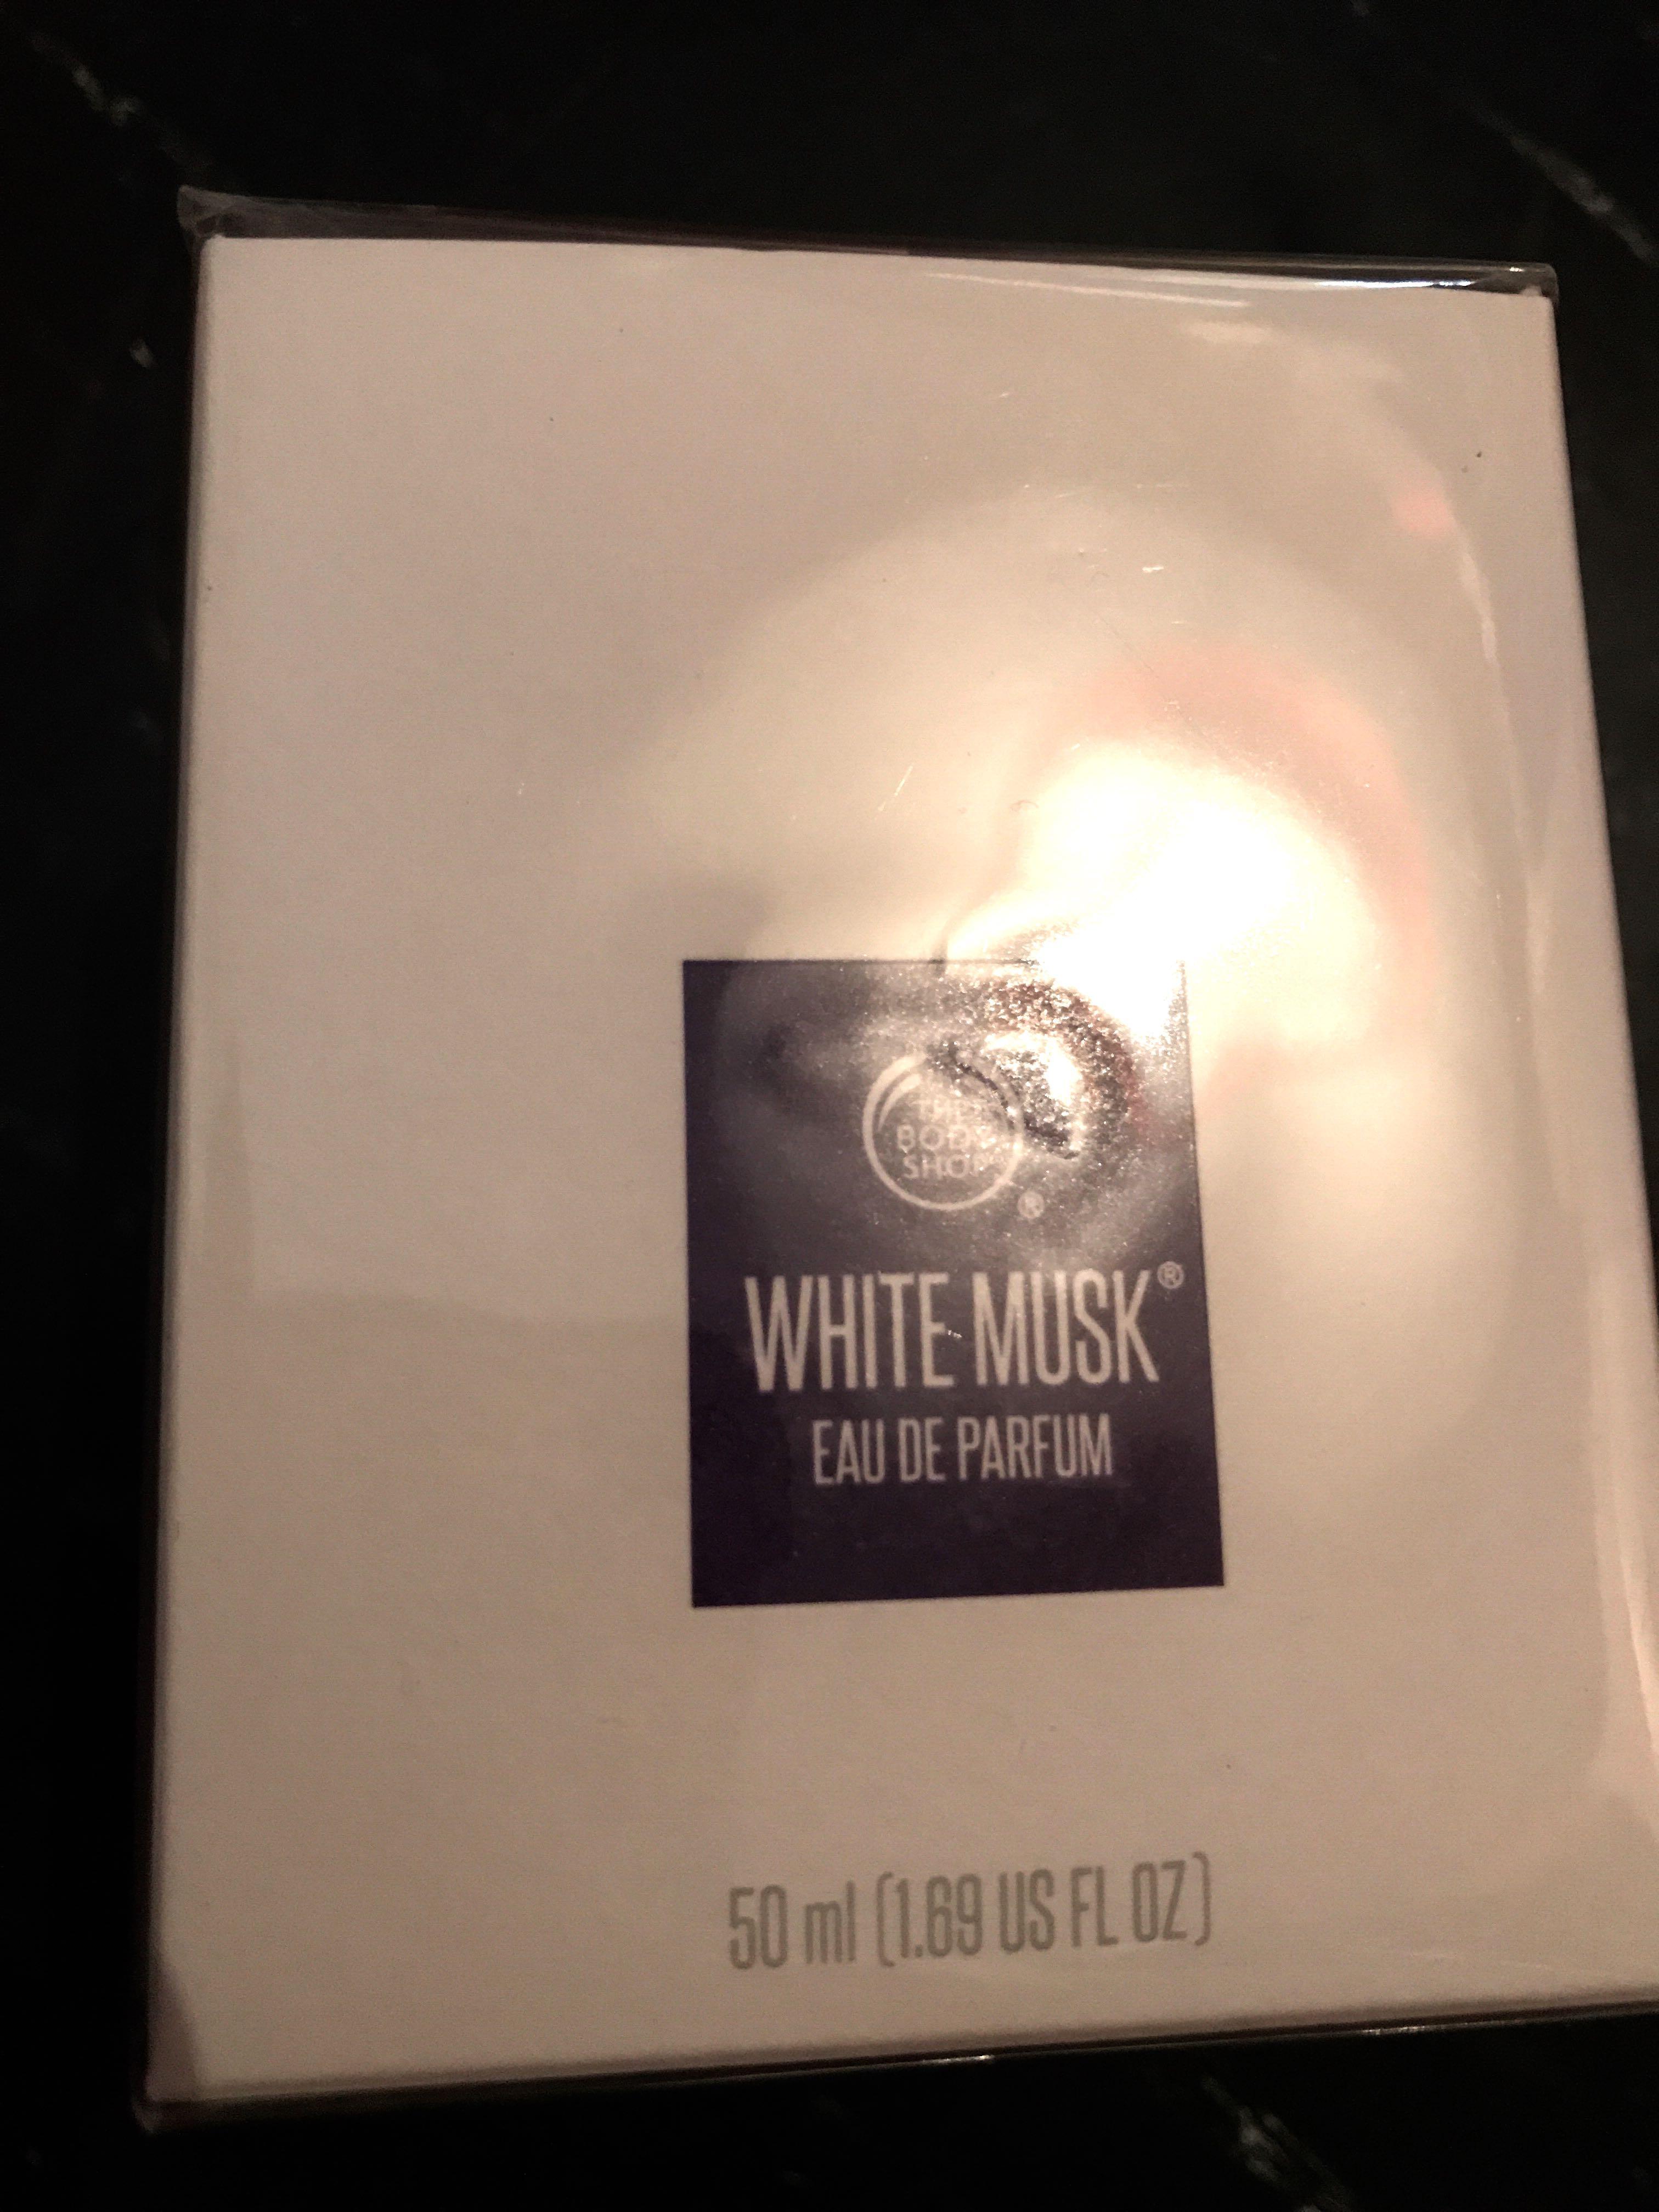 Bodyshop 50ml White Musk Edp Health Beauty Perfumes Deodorants Parfum Al Rehab Minyak Wangi On Carousell